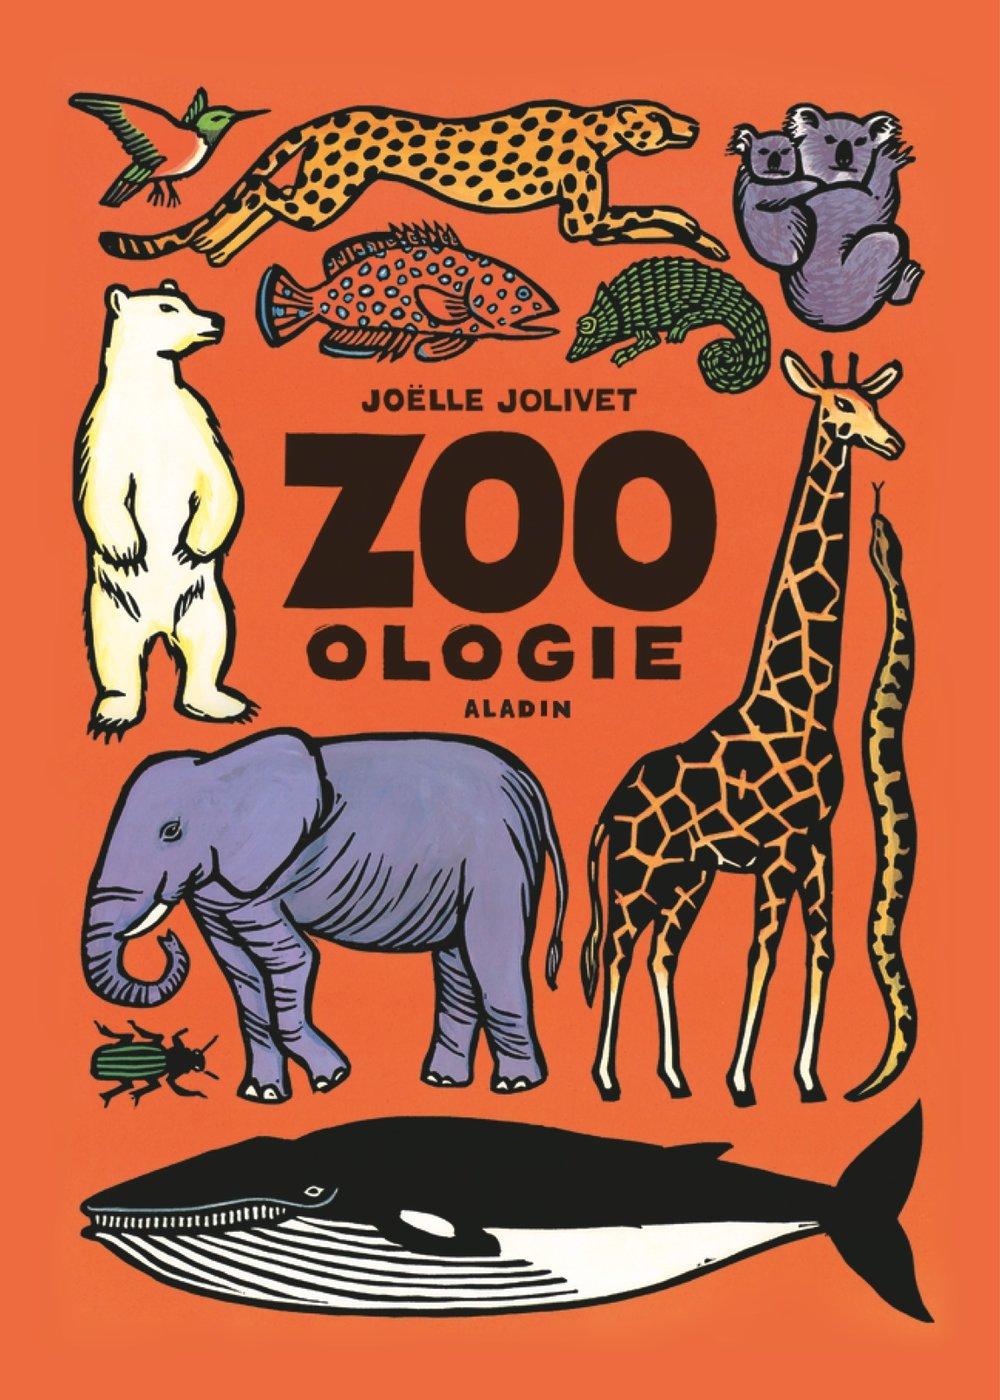 Kiludo-Zooologie.jpg